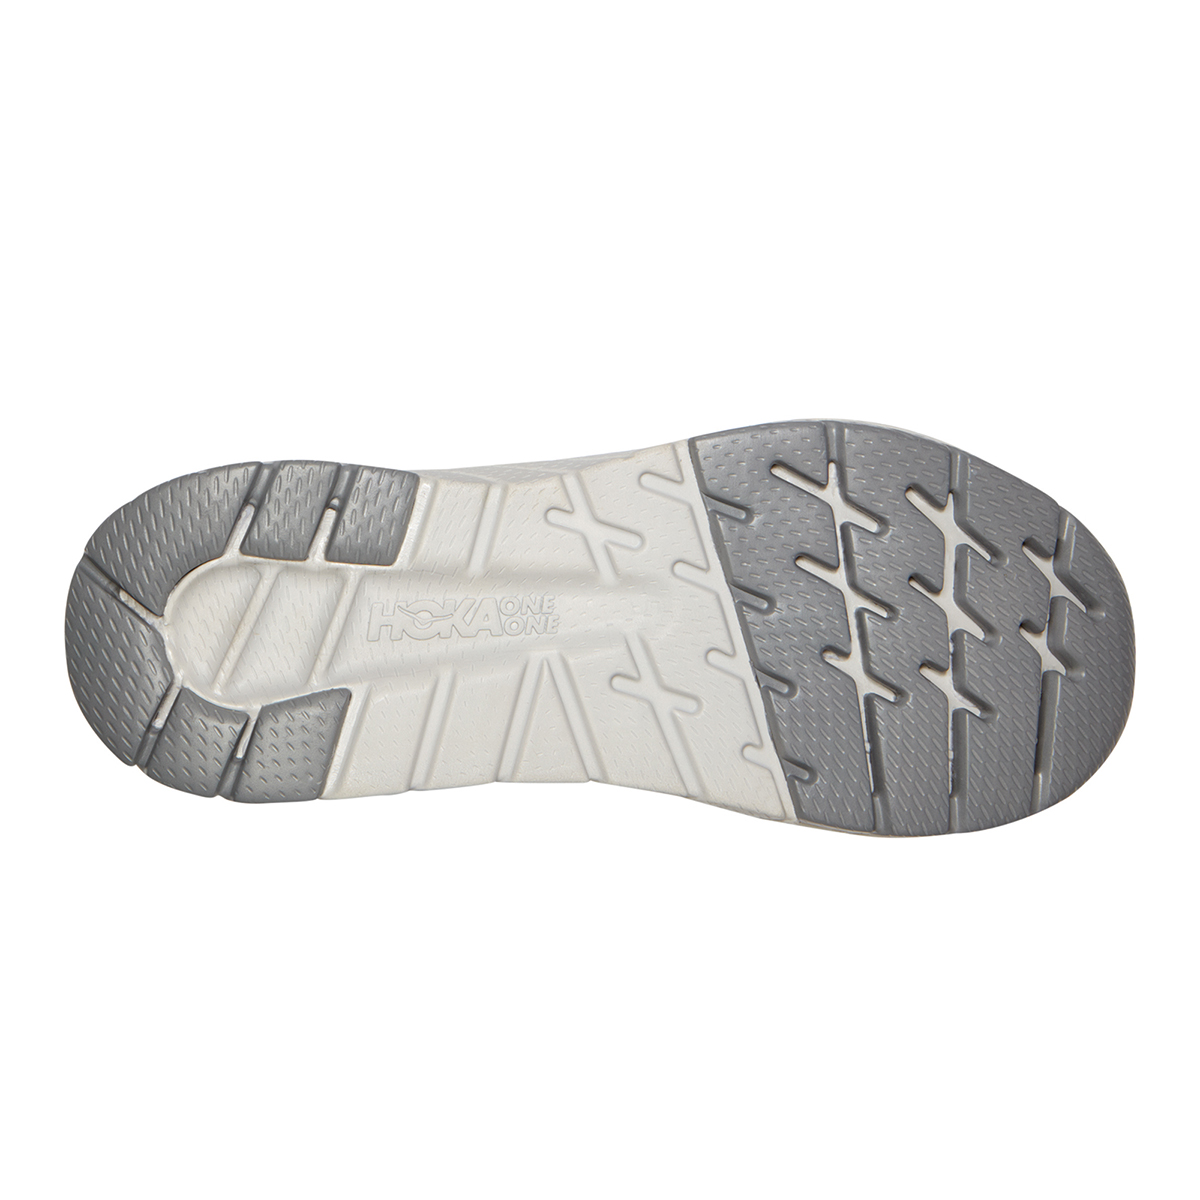 Men's Hoka One One Cavu 3 Running Shoe - Color: White/Nimbus Cloud - Size: 7 - Width: Regular, White/Nimbus Cloud, large, image 4